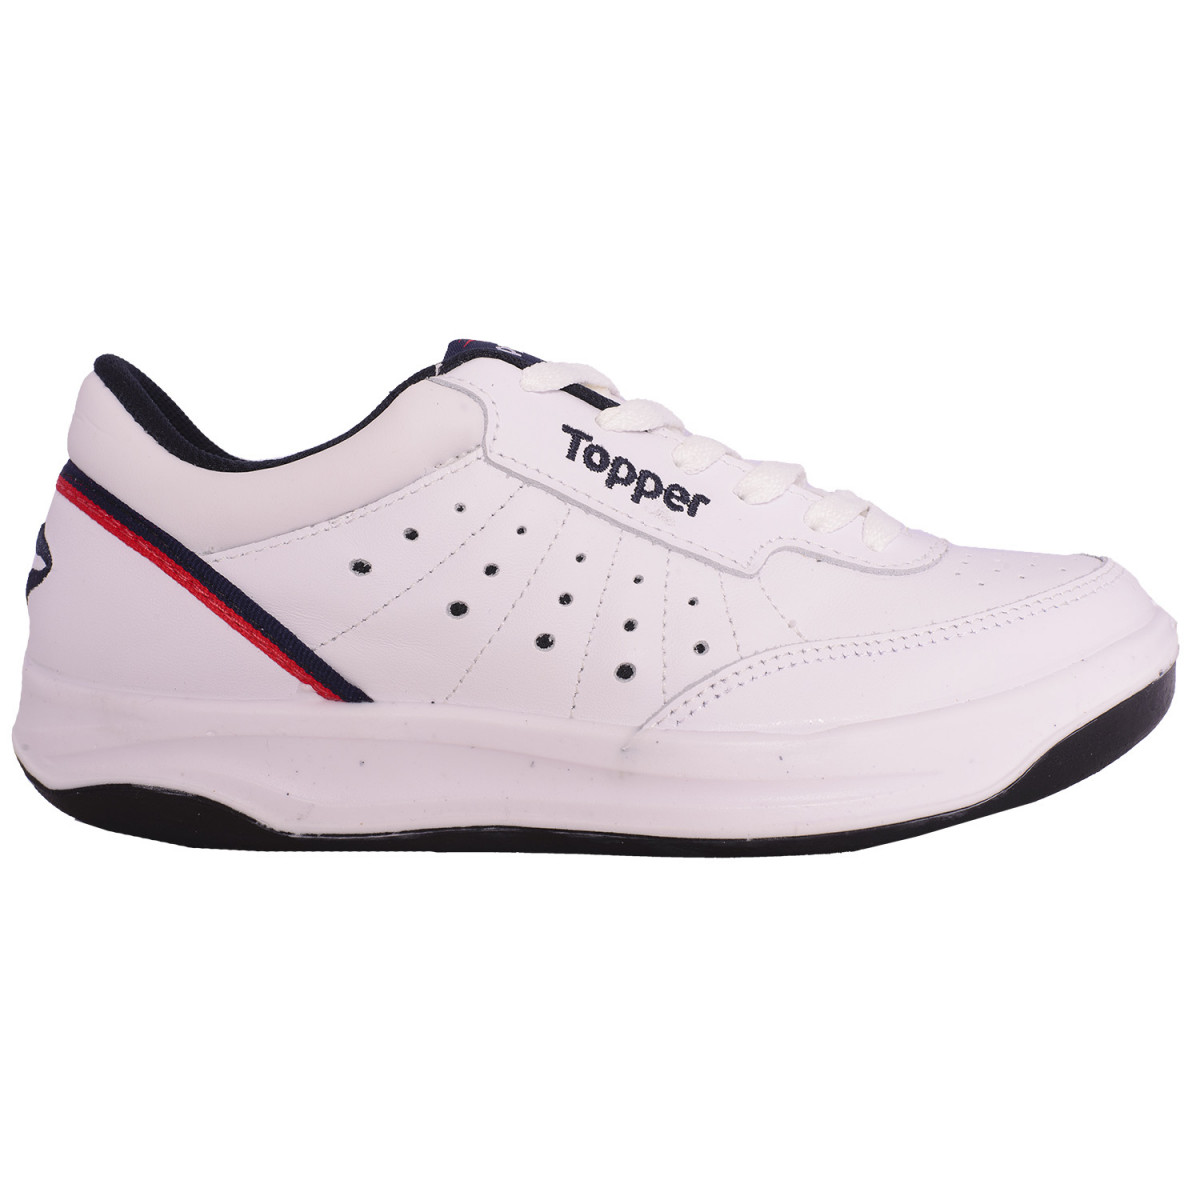 Zapatillas Topper X Forcer